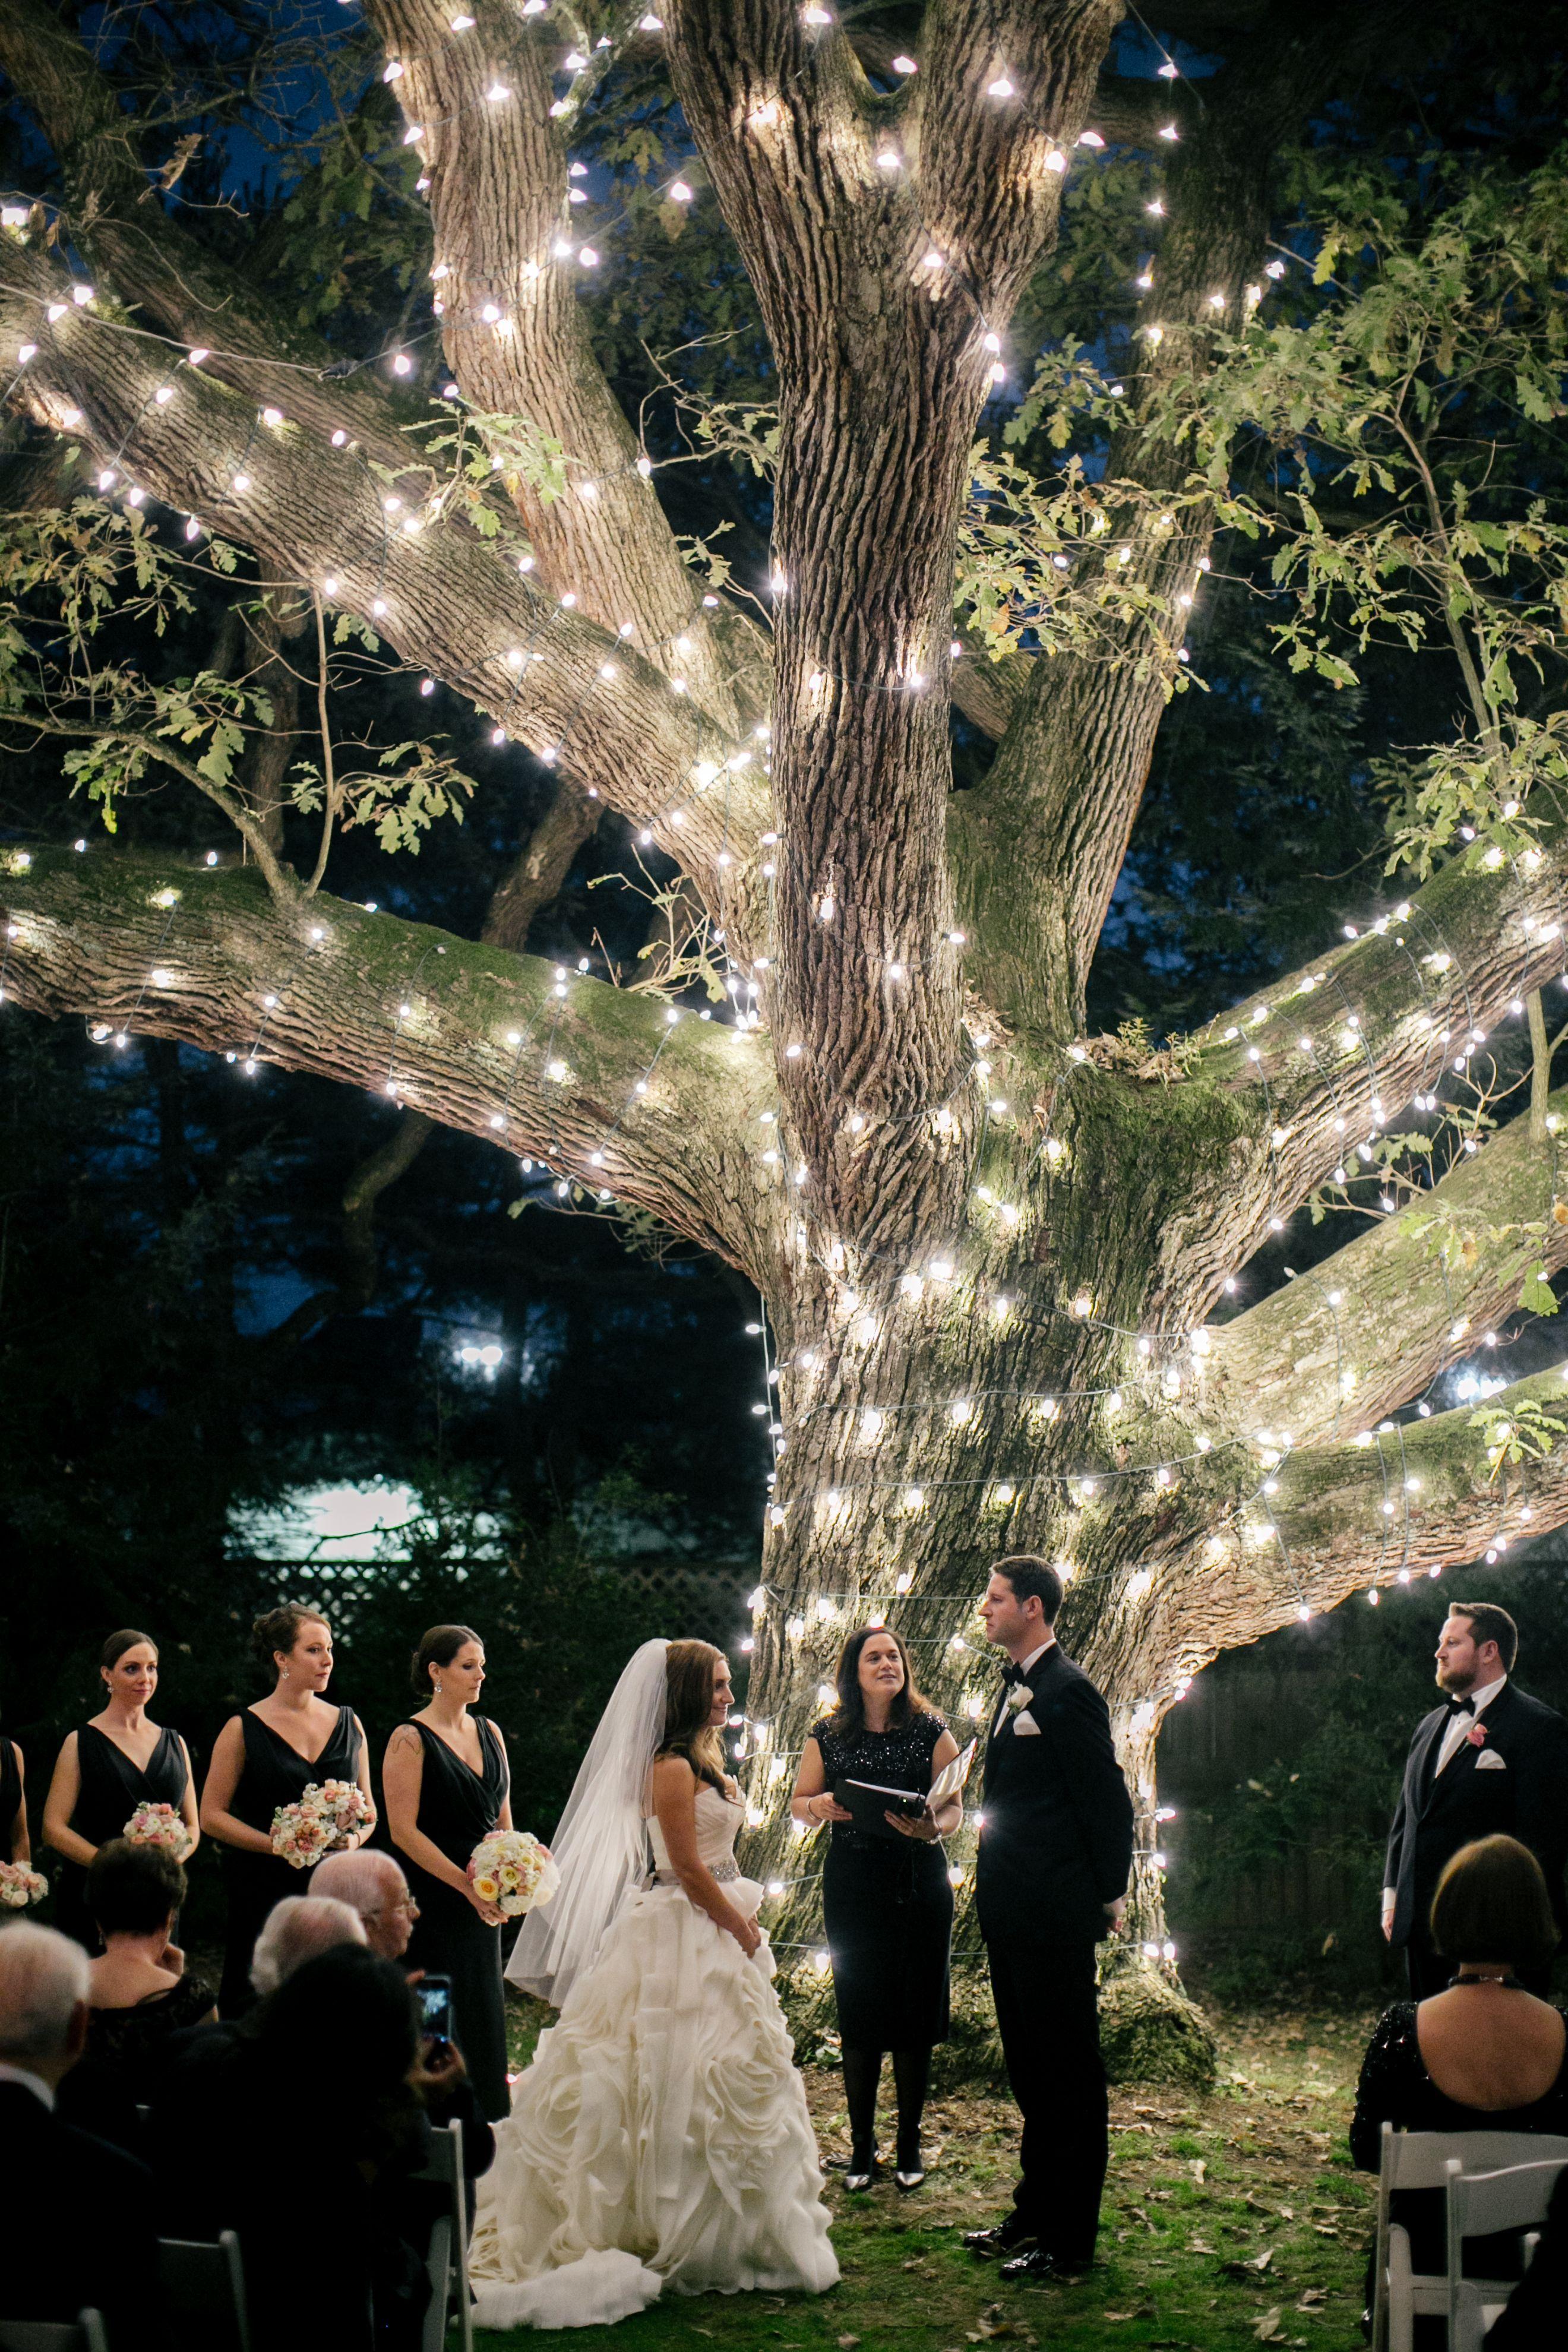 Amagicalromanticweddingataldiemansionindoylestownpennsylvania: Wedding Venues Near Doylestown Pennsylvania At Websimilar.org